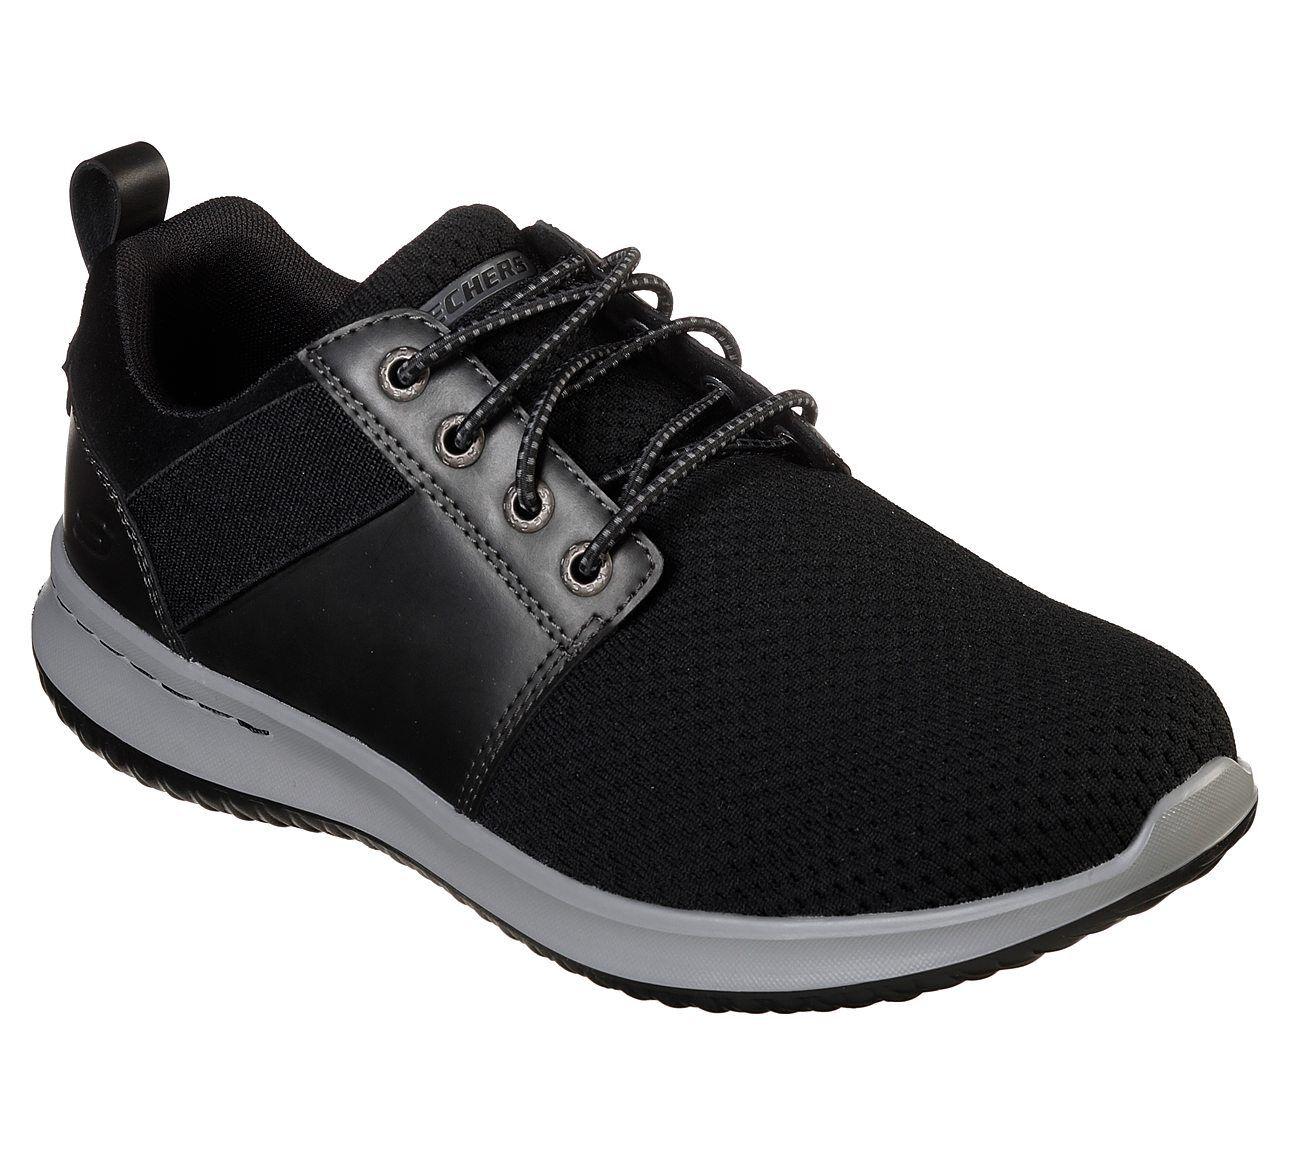 Skechers shoes Black Men's Air Memory Foam Comfort Casual Sporty Flex Mesh 65642